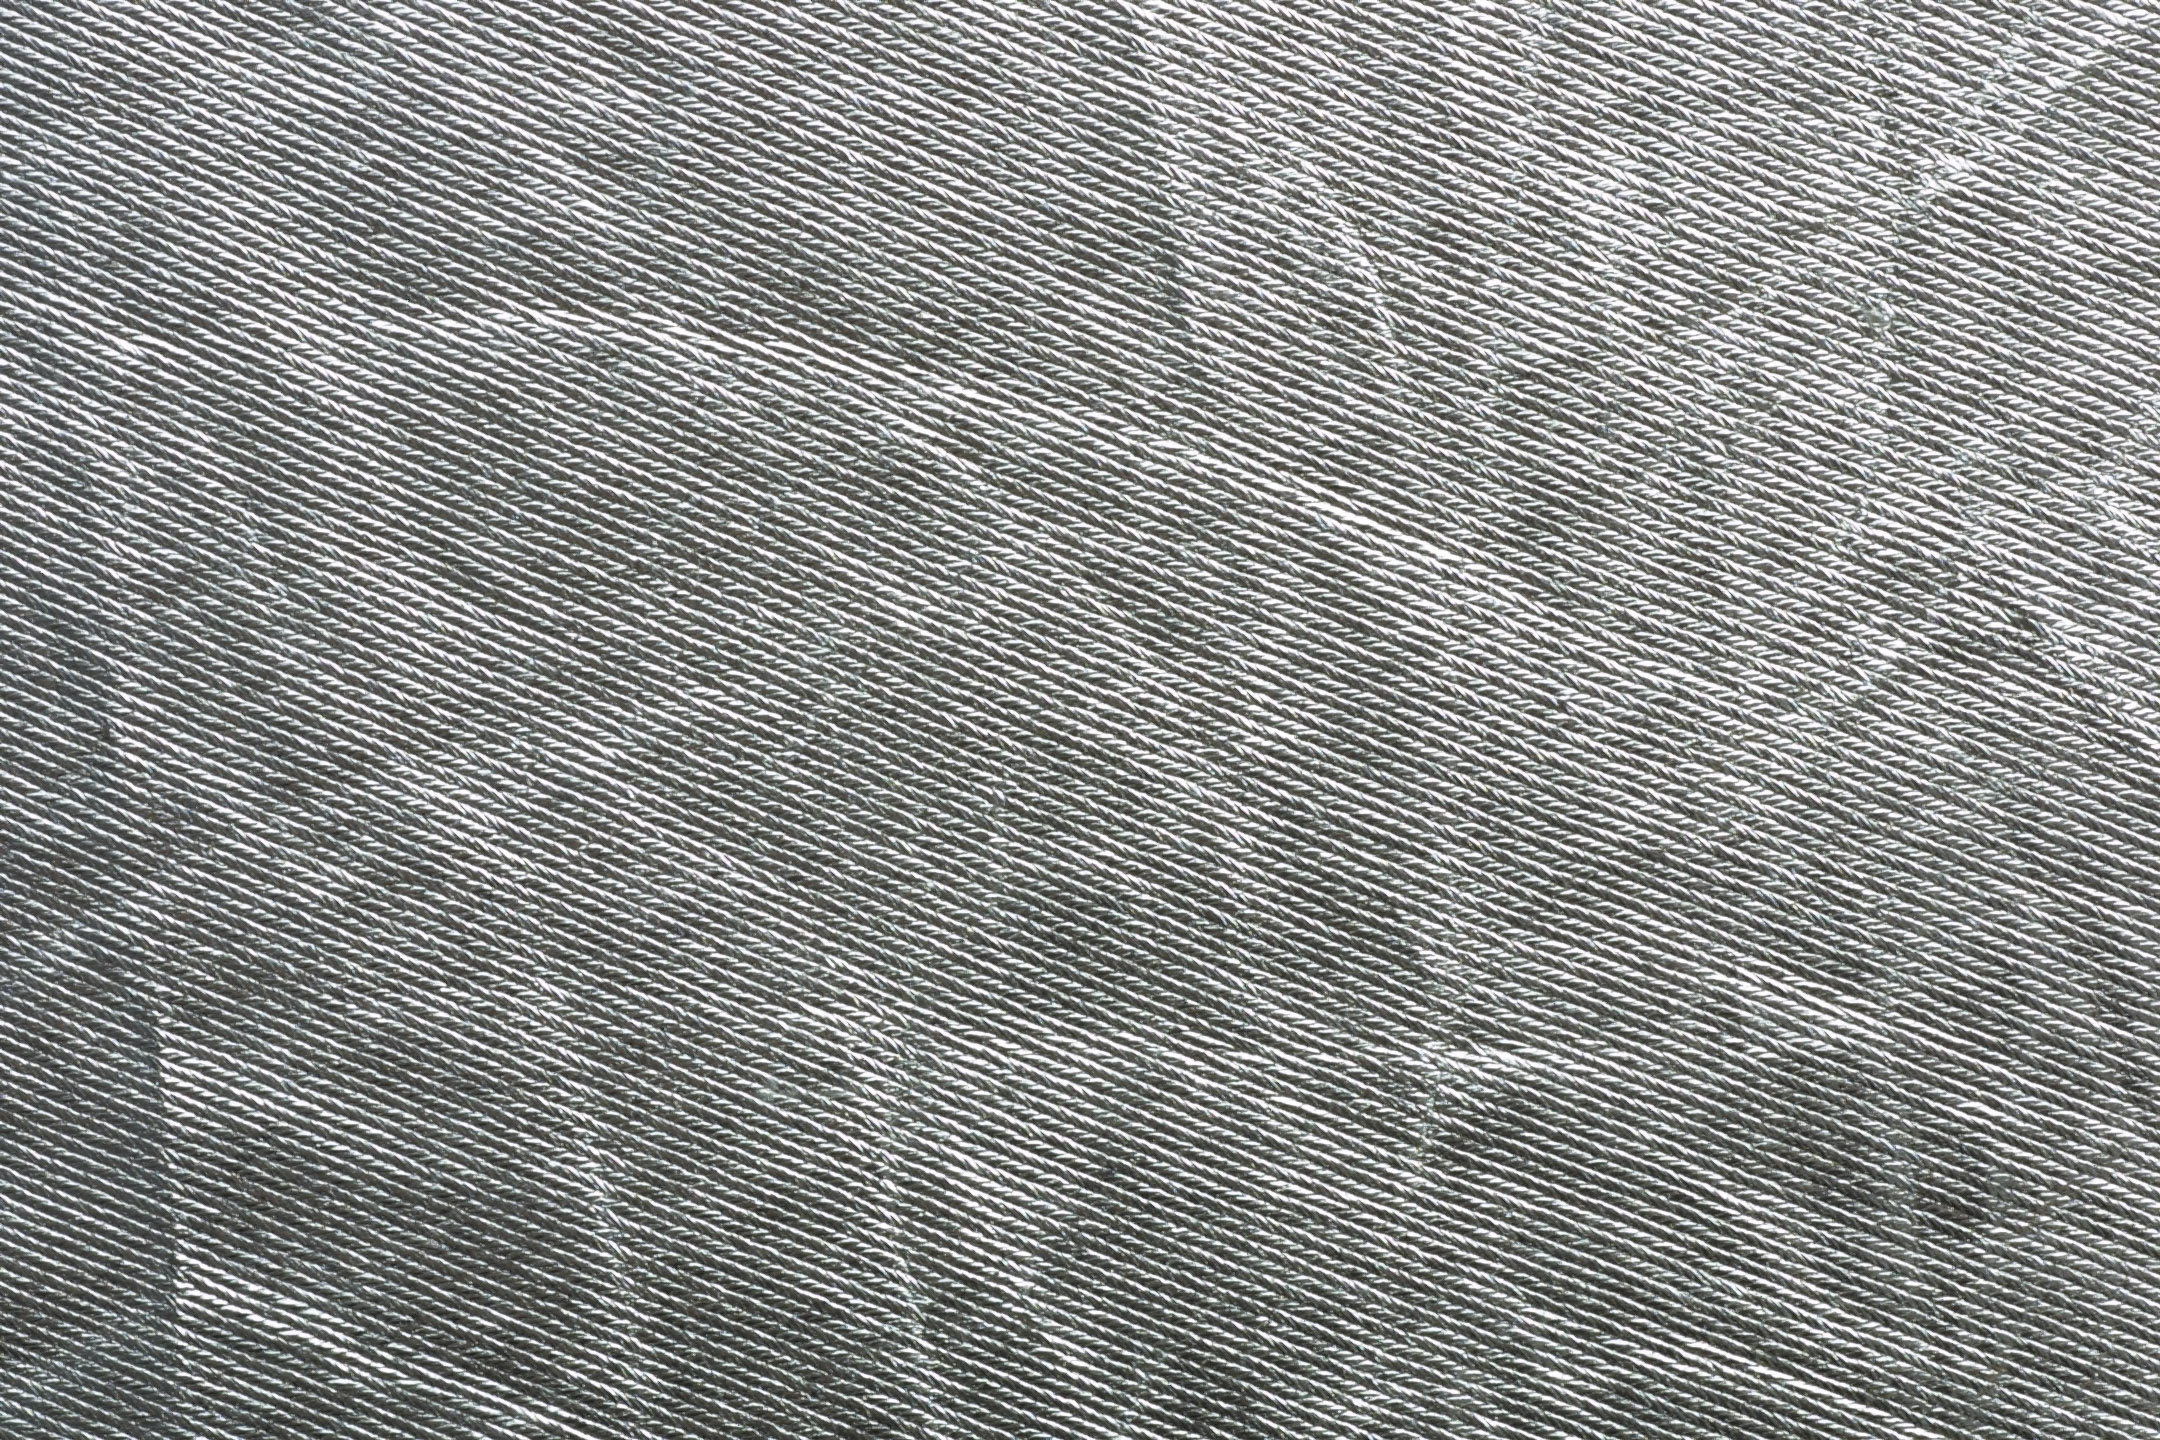 silver textured wallpaper   get domain pictures   getdomainvidscom 2160x1440